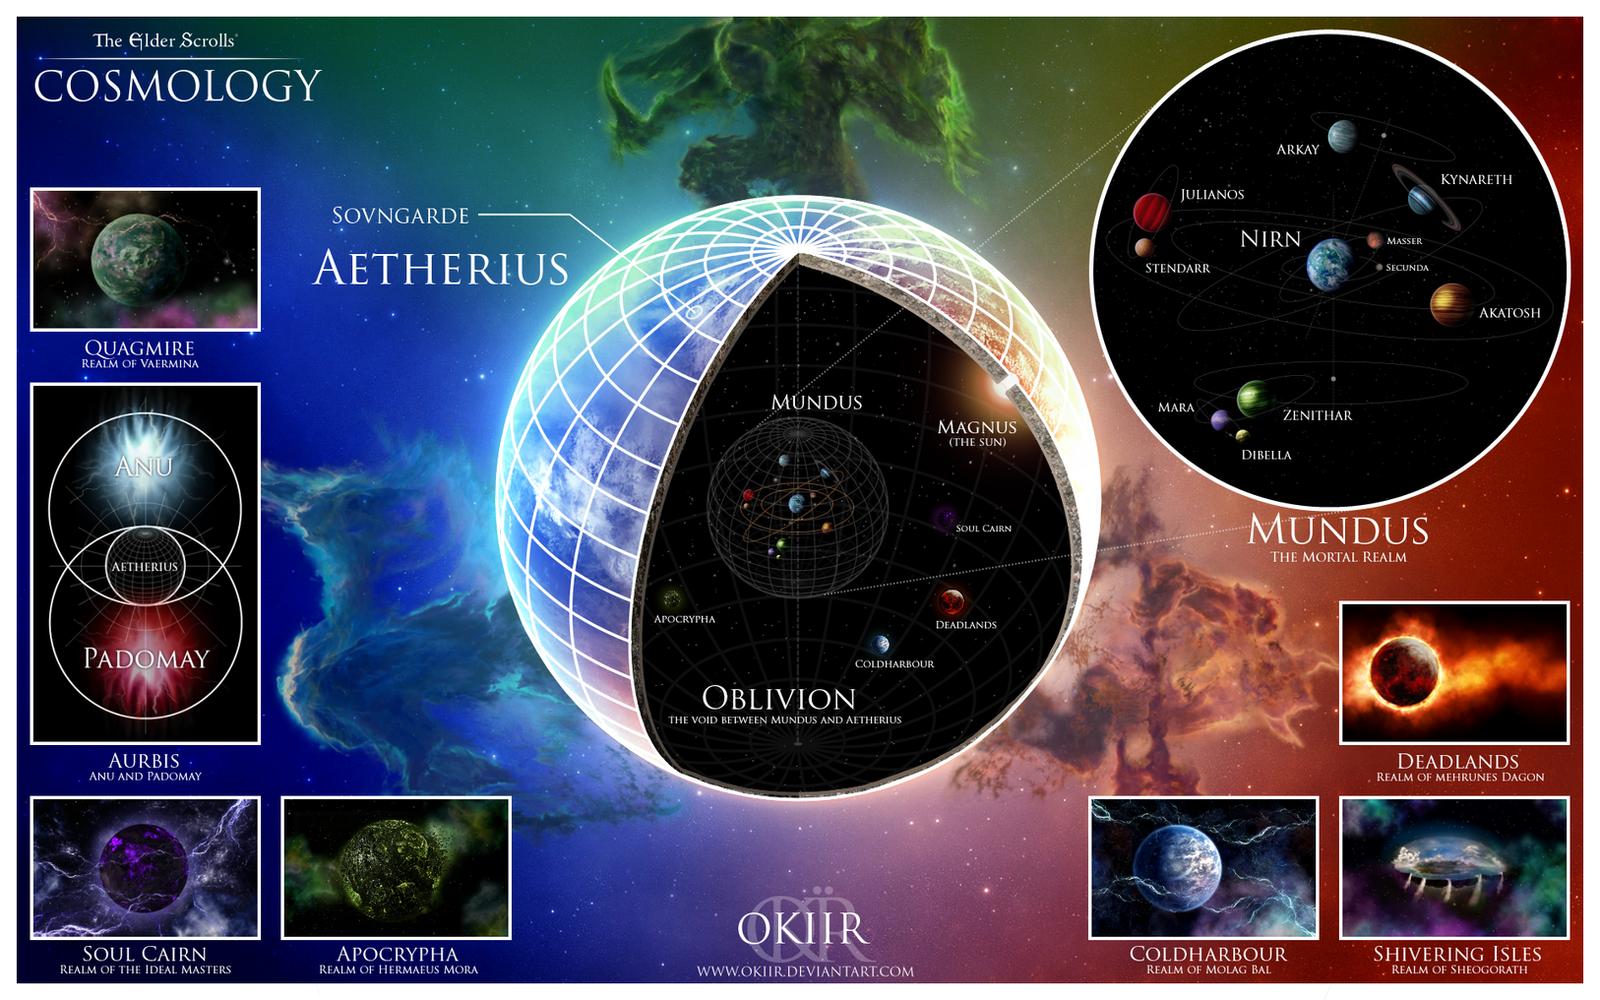 The Elder Scrolls: Cosmology by okiir on DeviantArt